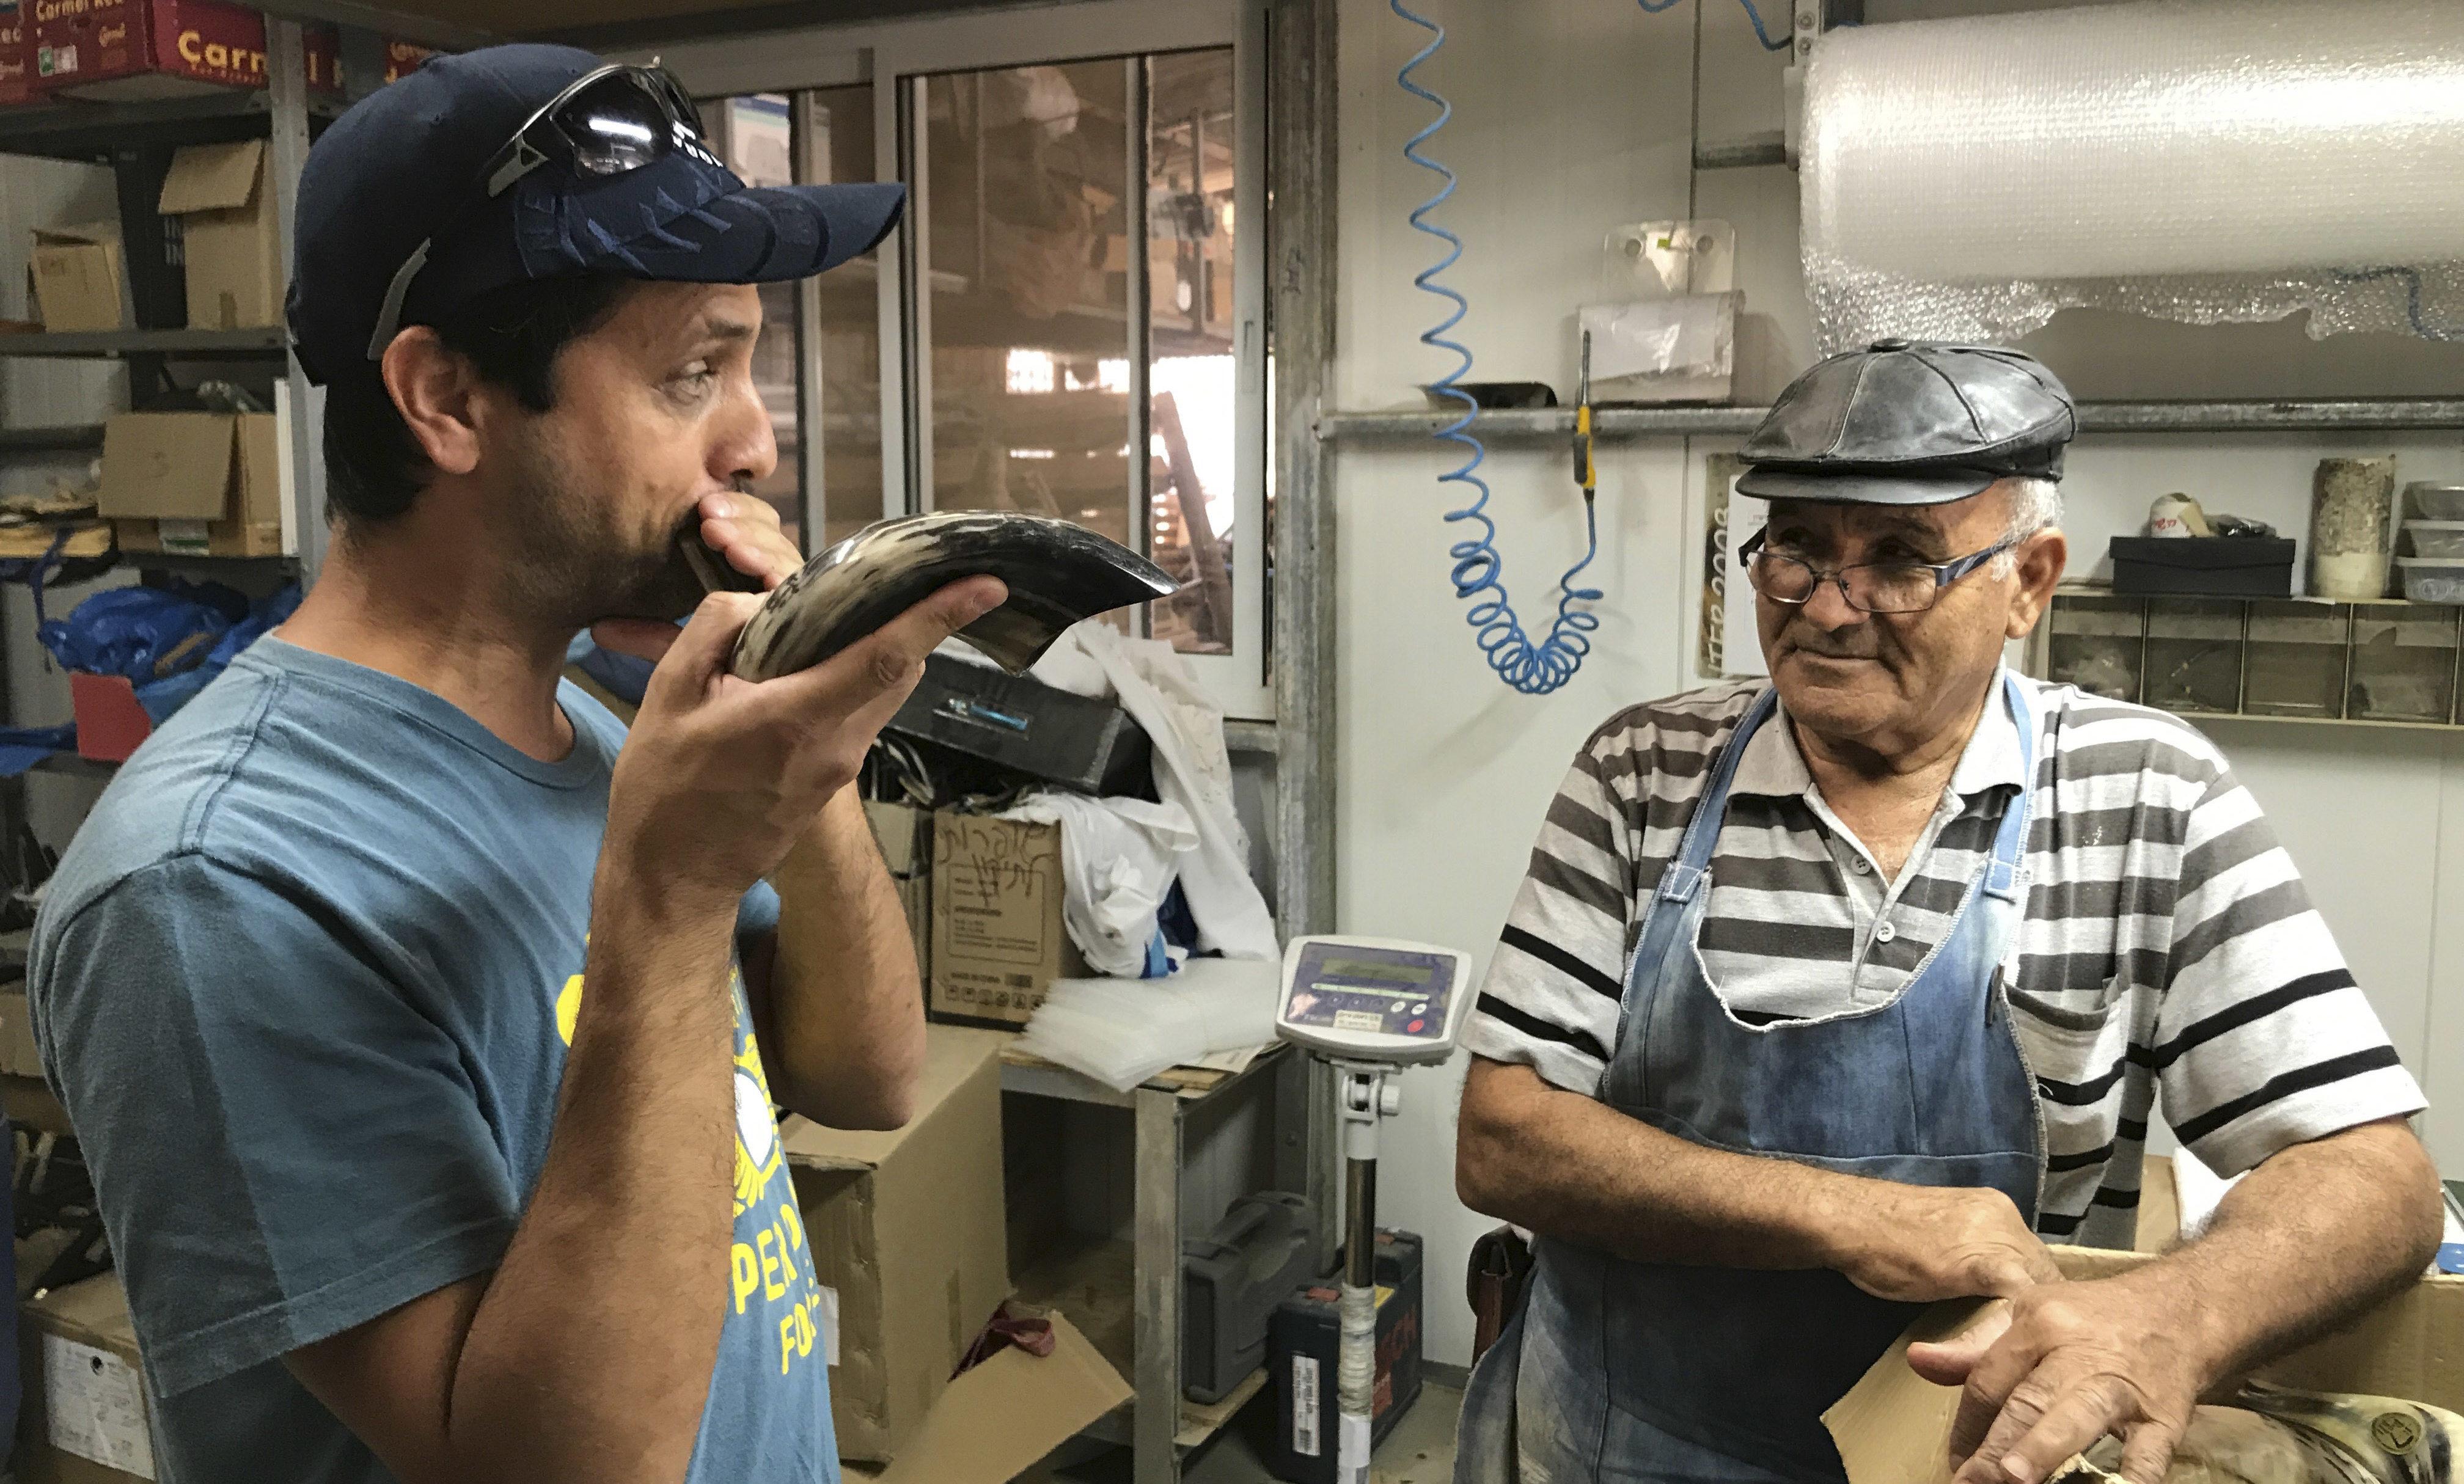 Dror Yoggev blowing a shofar while Shimon Keinan watches at his Kol Shofar factory in Givat Yoav, Golan Heights, Sept. 6, 2017 (Photo/JTA-Andrew Tobin)